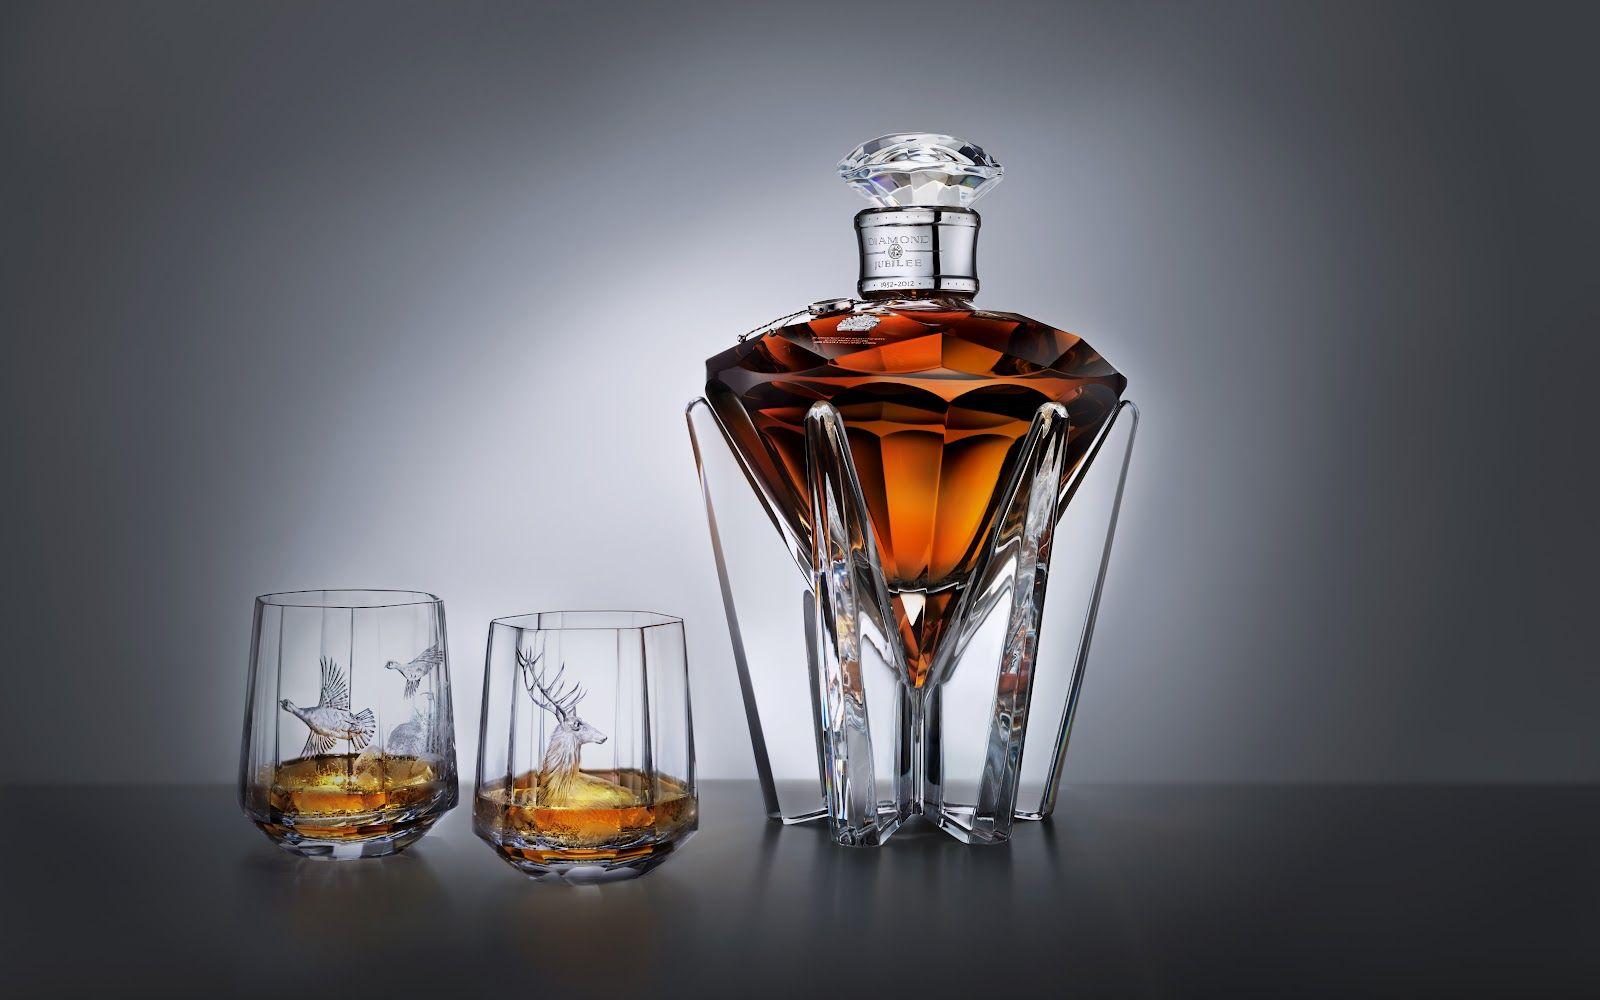 Johnnie Walker S Diamond Jubilee Whisky Bottle Whisky Cigars And Whiskey